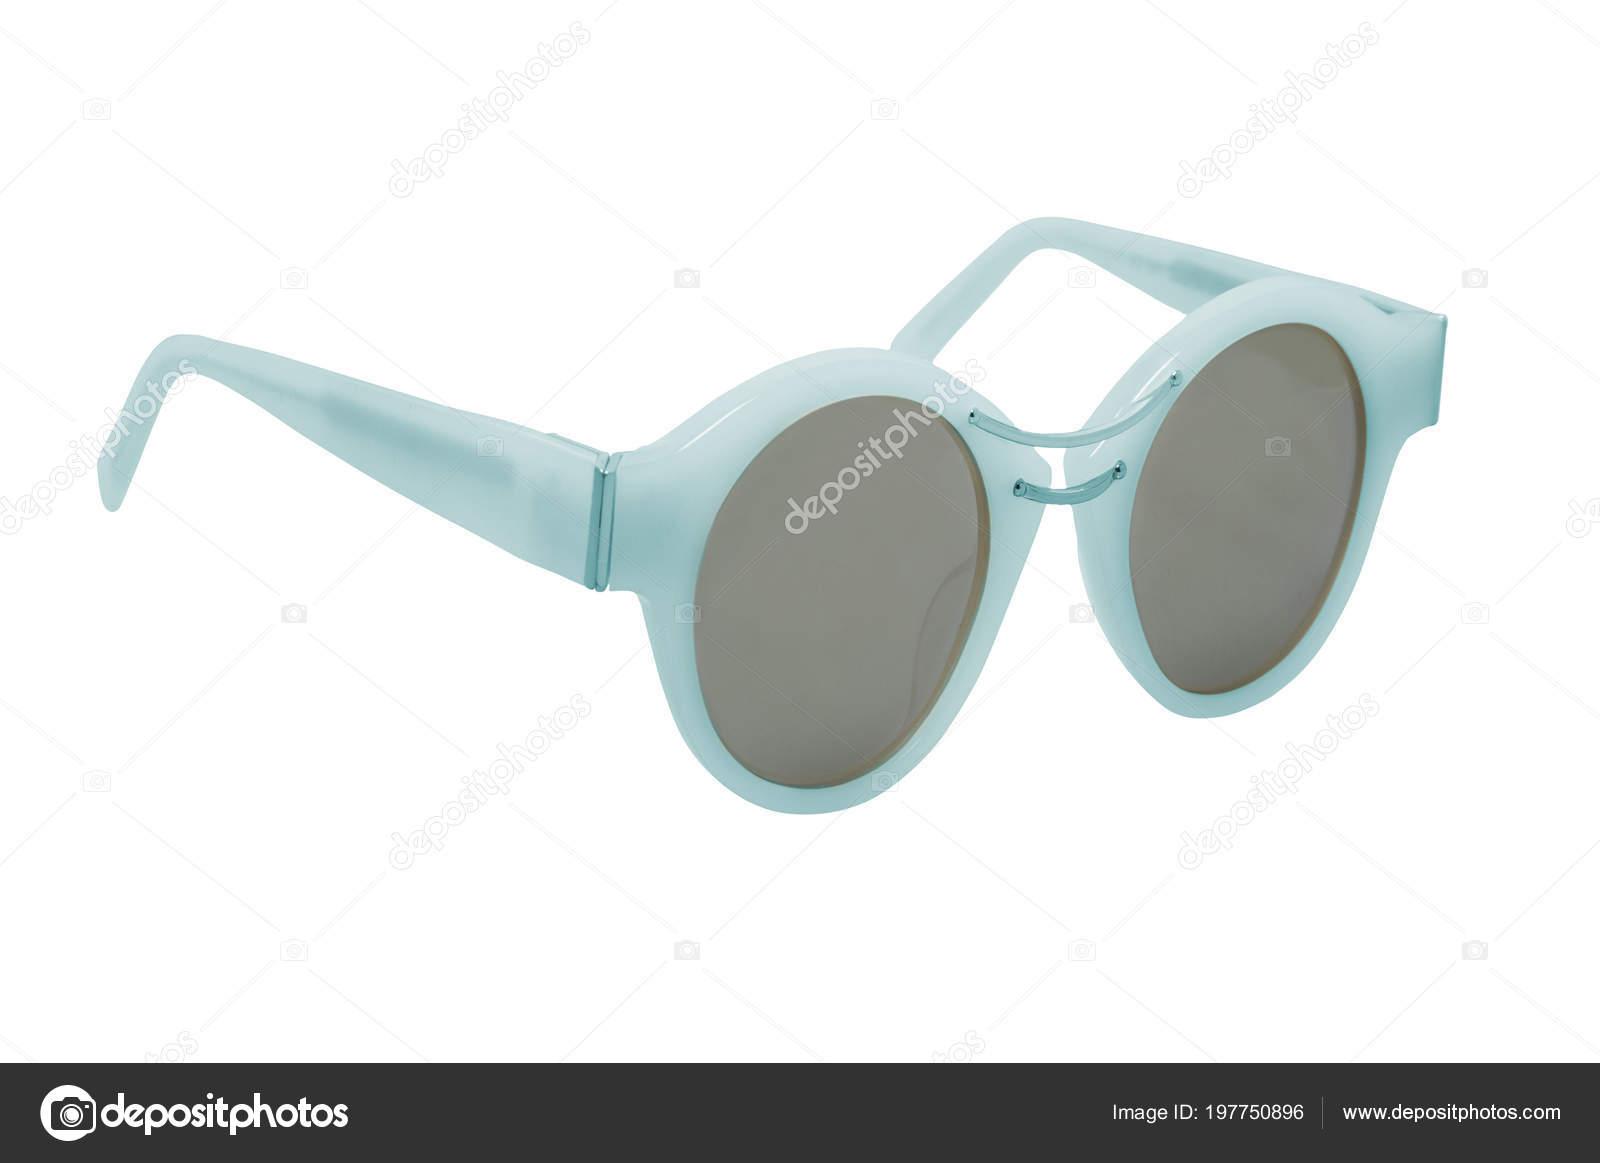 7ed248bced Μπλε Γυαλιά Ηλίου Γυναικών Απομονώνονται Λευκό Φόντο — Φωτογραφία Αρχείου